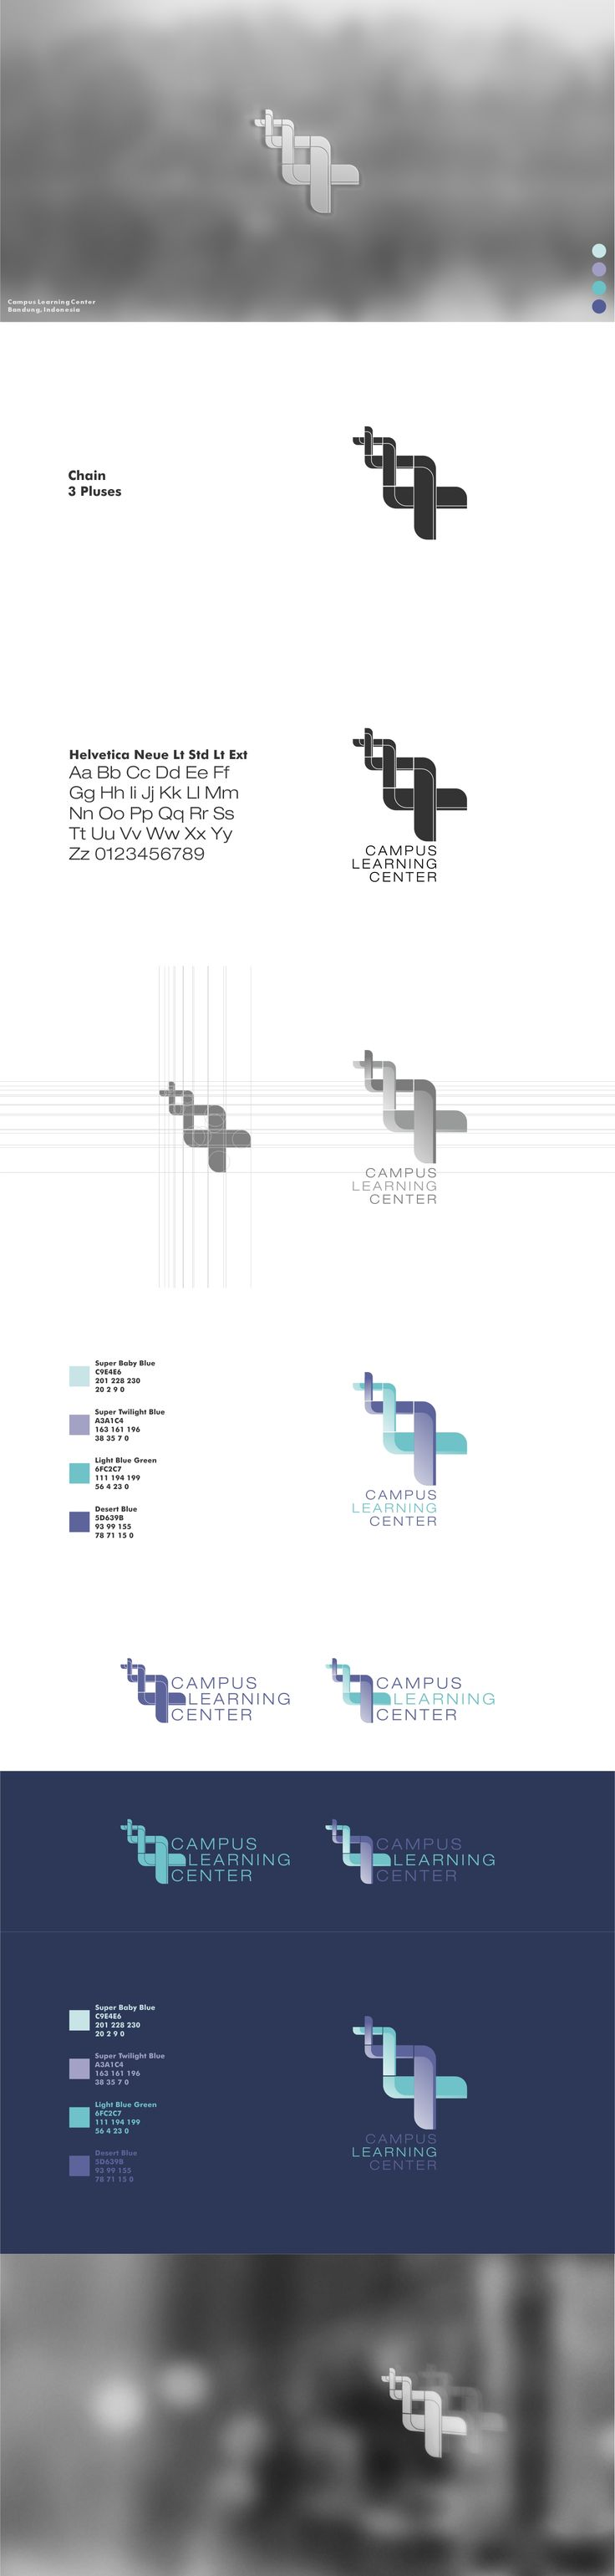 Campus Learning Center - Visual Identity #visual #identity #visualidentity #logo #graphic #design #graphicdesign #digitalart #presentation #portfolio